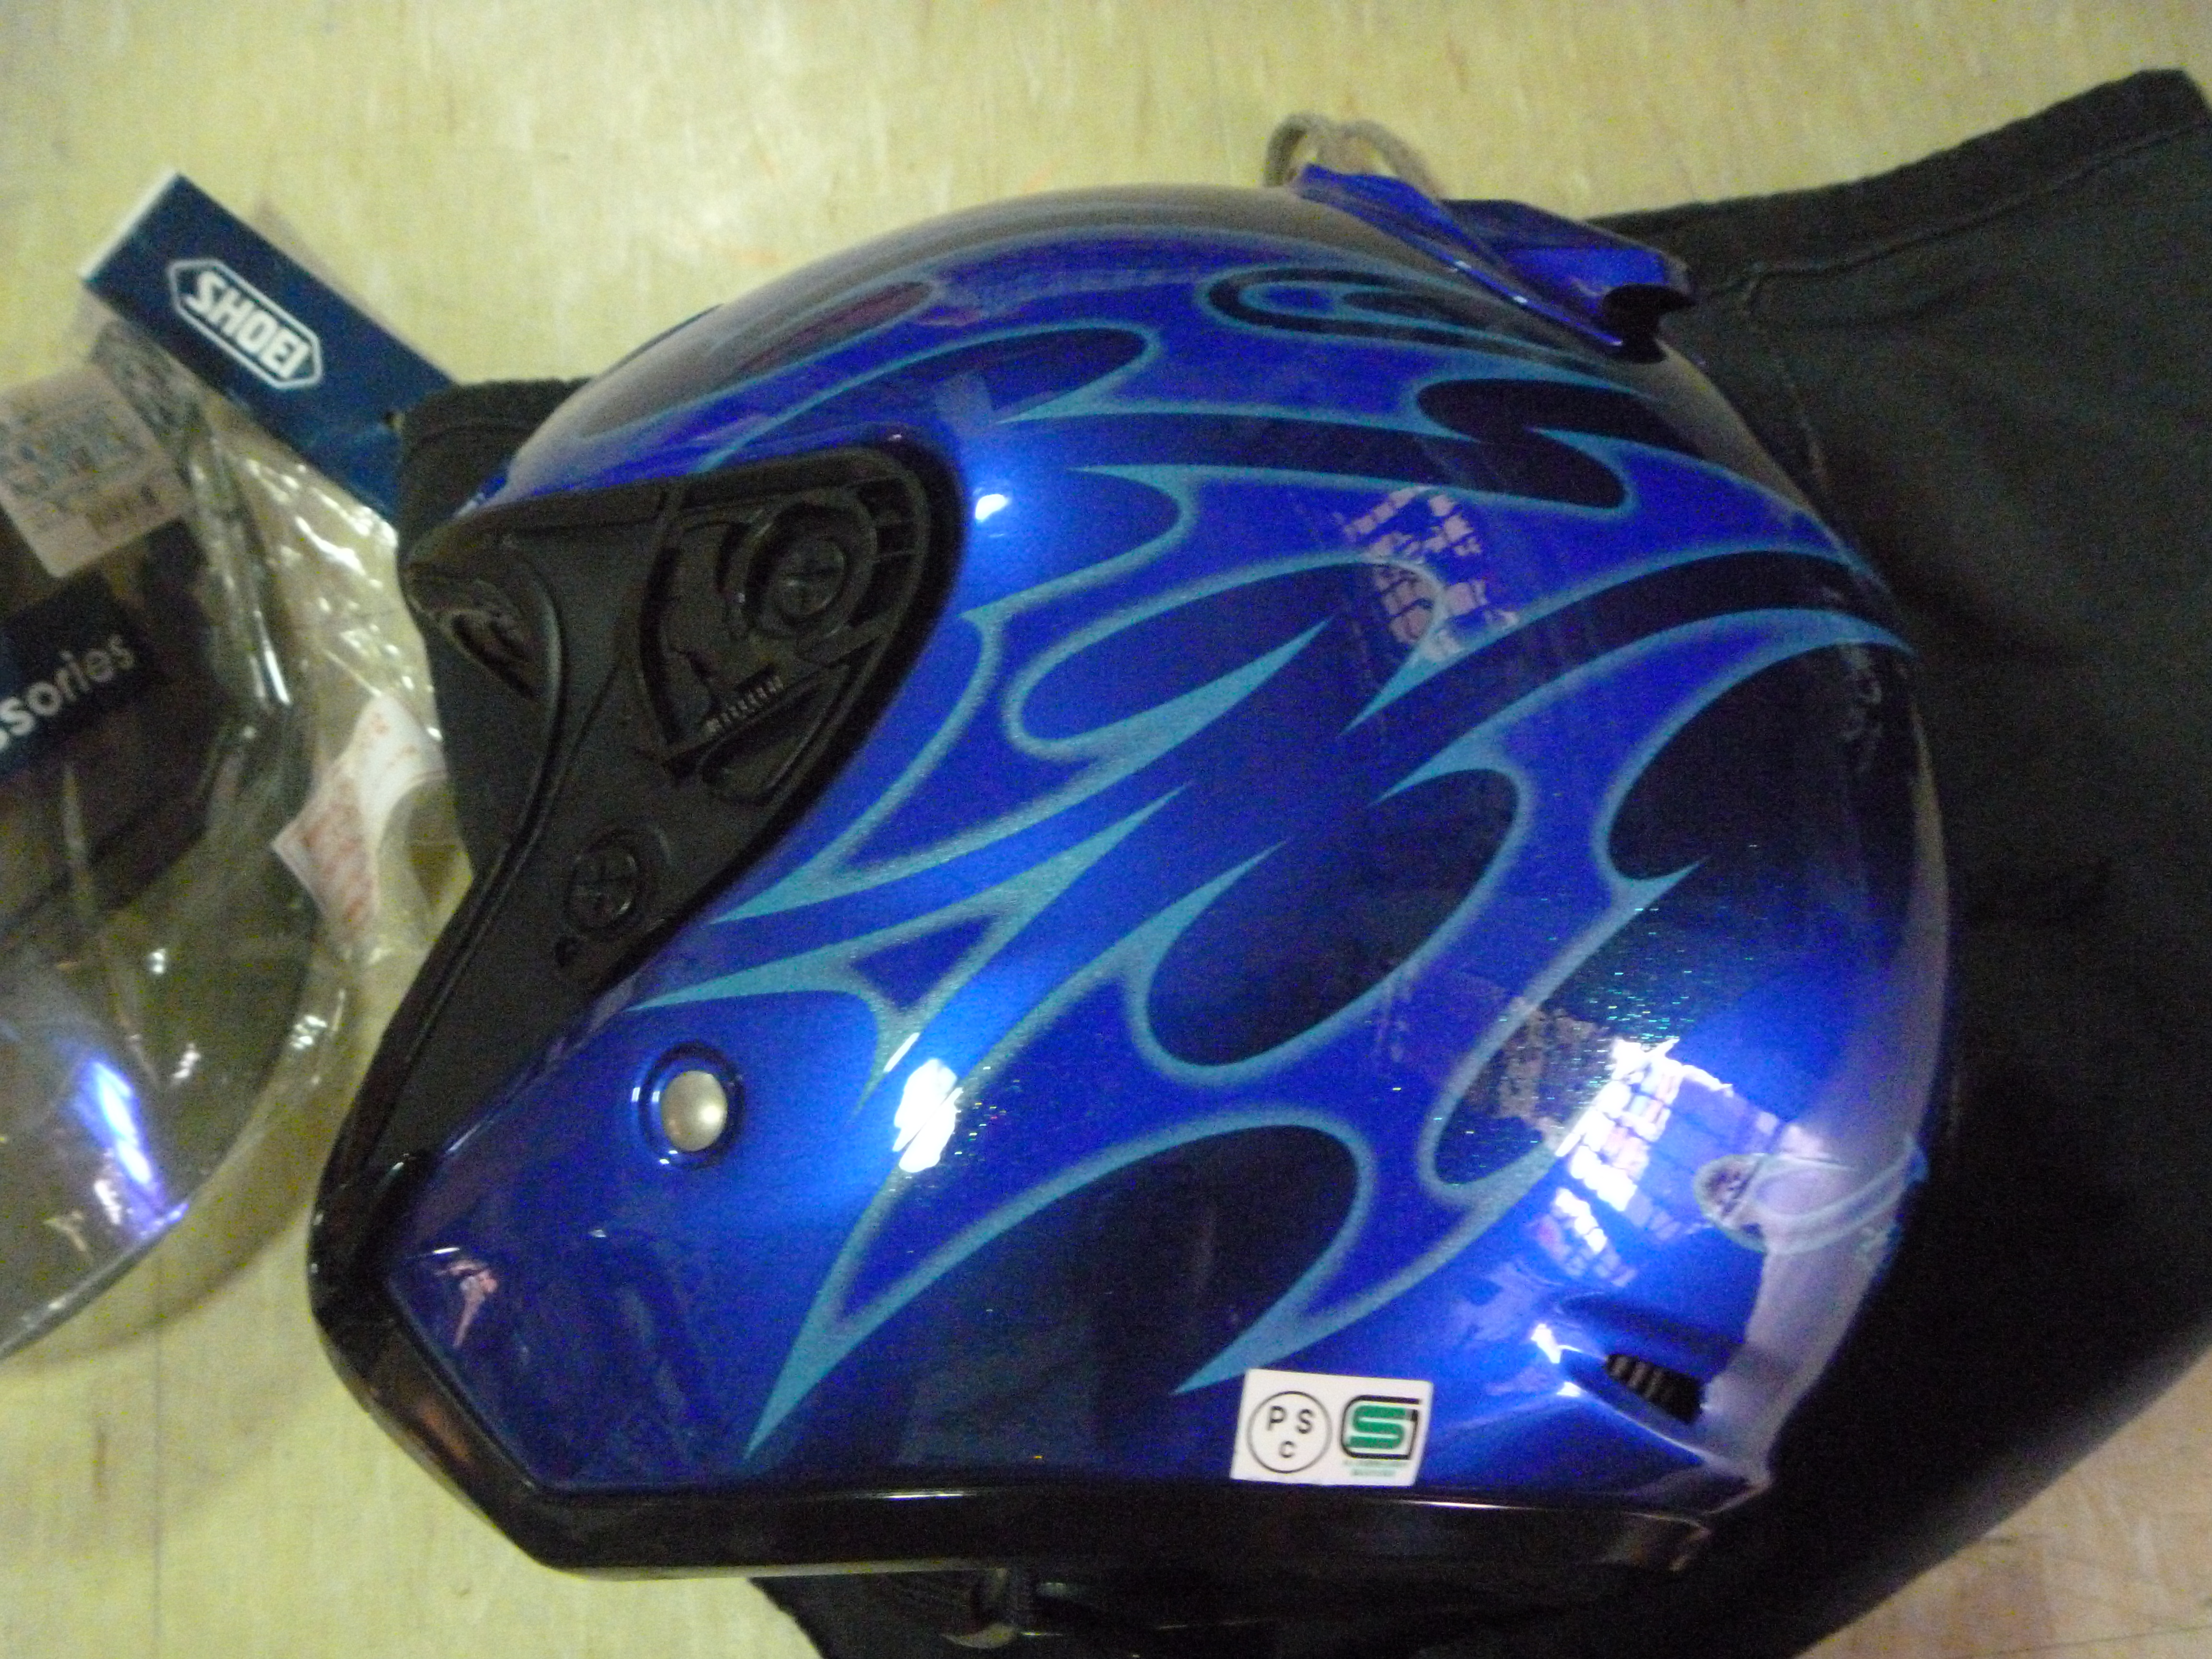 4173e294 Shoei J Force 2 II Jack Blue L 9.5/10 Complete. November 4, 2013 · P1050208  P1050209 P1050210 P1050211 P1050212 P1050213 P1050214 P1050215 P1050216